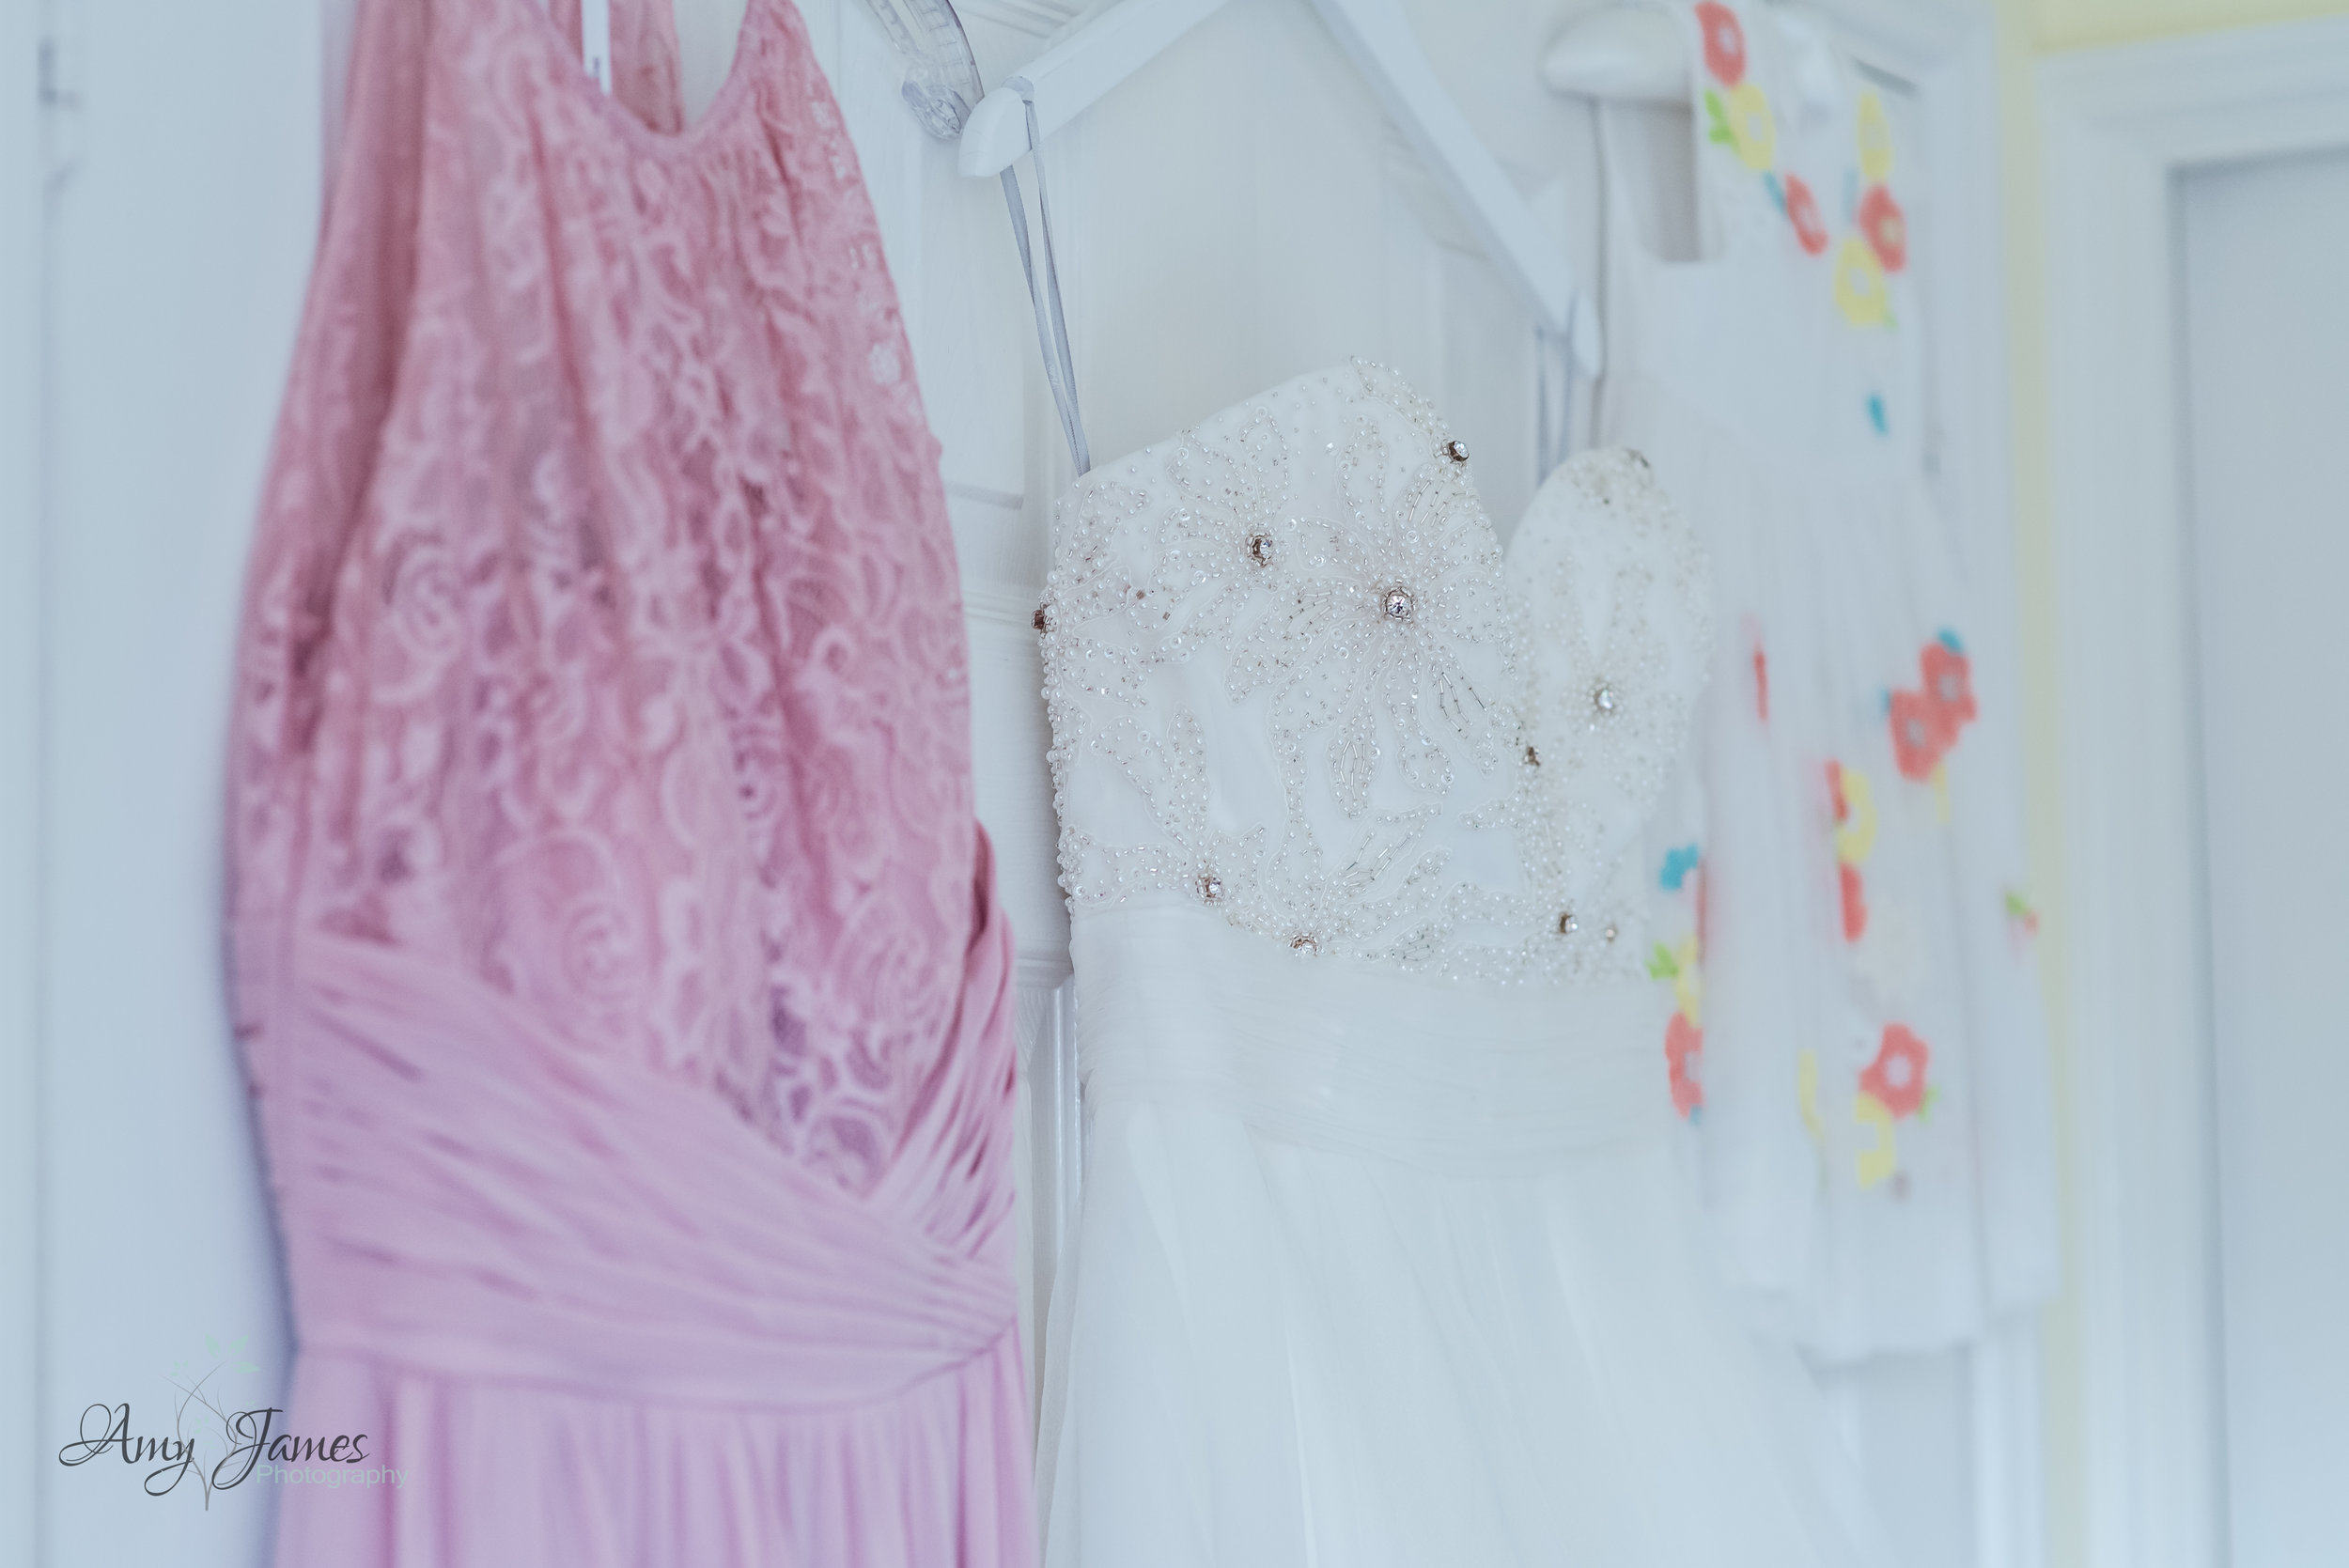 Taplins Place Wedding - Hampshire wedding Photographer - Fleet wedding photographer - Amy James Photography-8.jpg